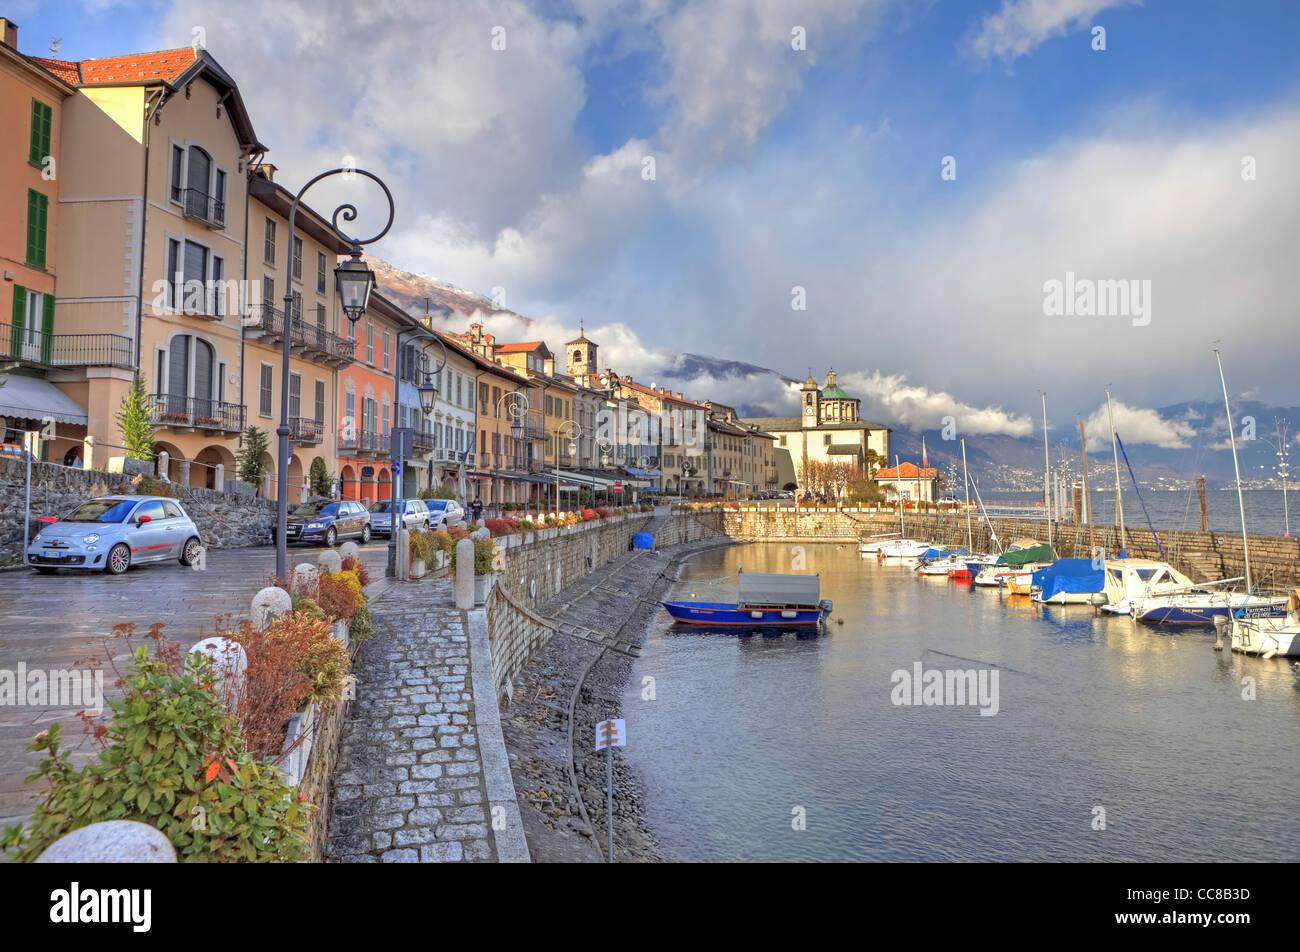 Waterfront and harbor of Cannobio, Verbania, Piedmont, Italy, Europe - Stock Image